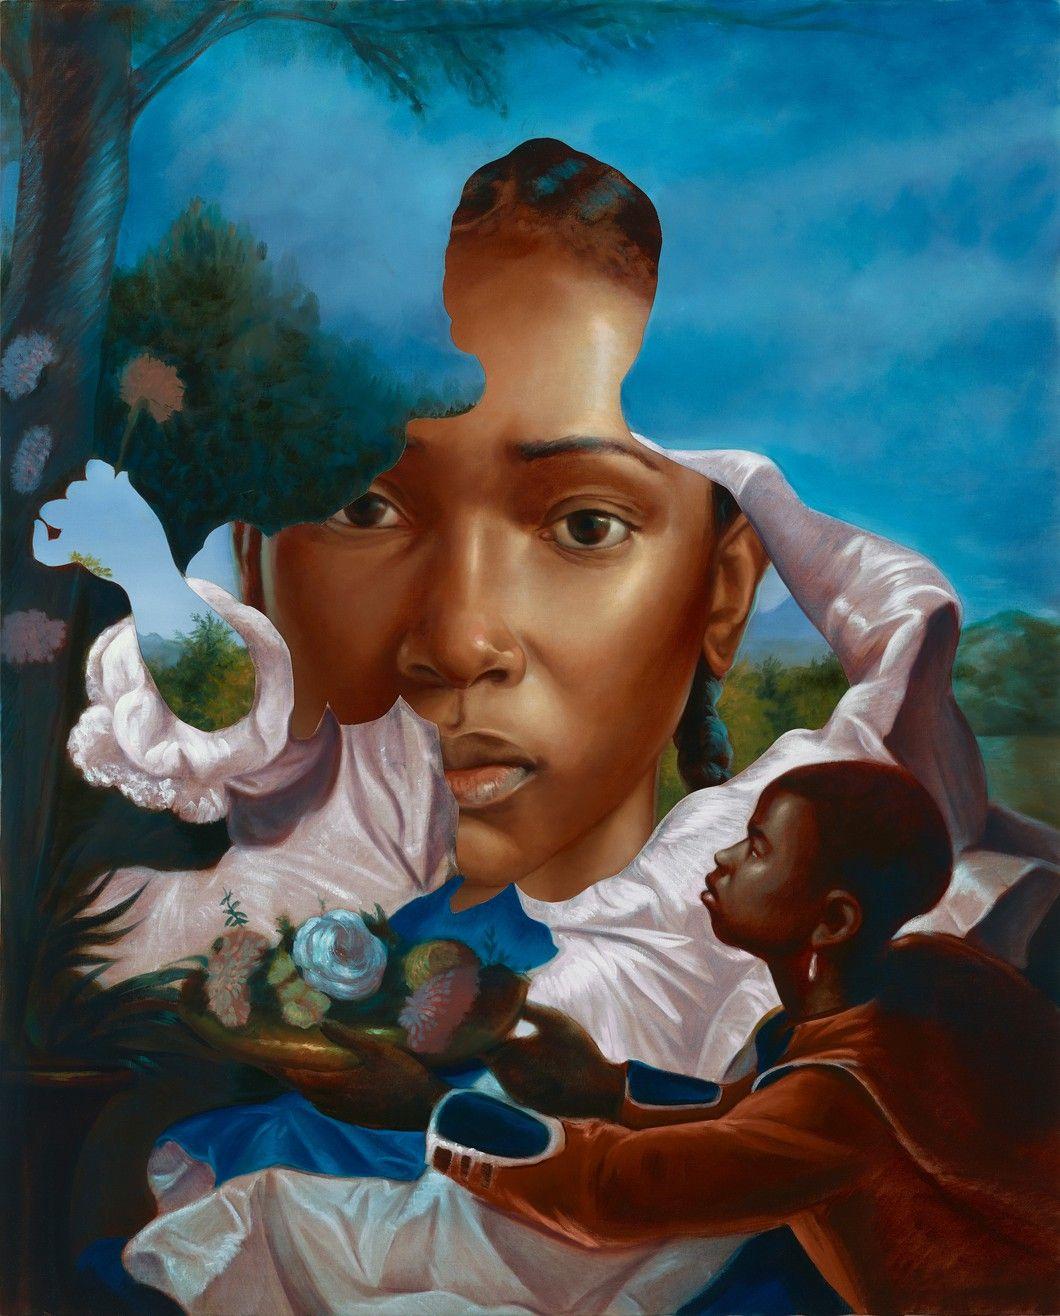 Titus Kaphar Gagosian in 2020 African american art